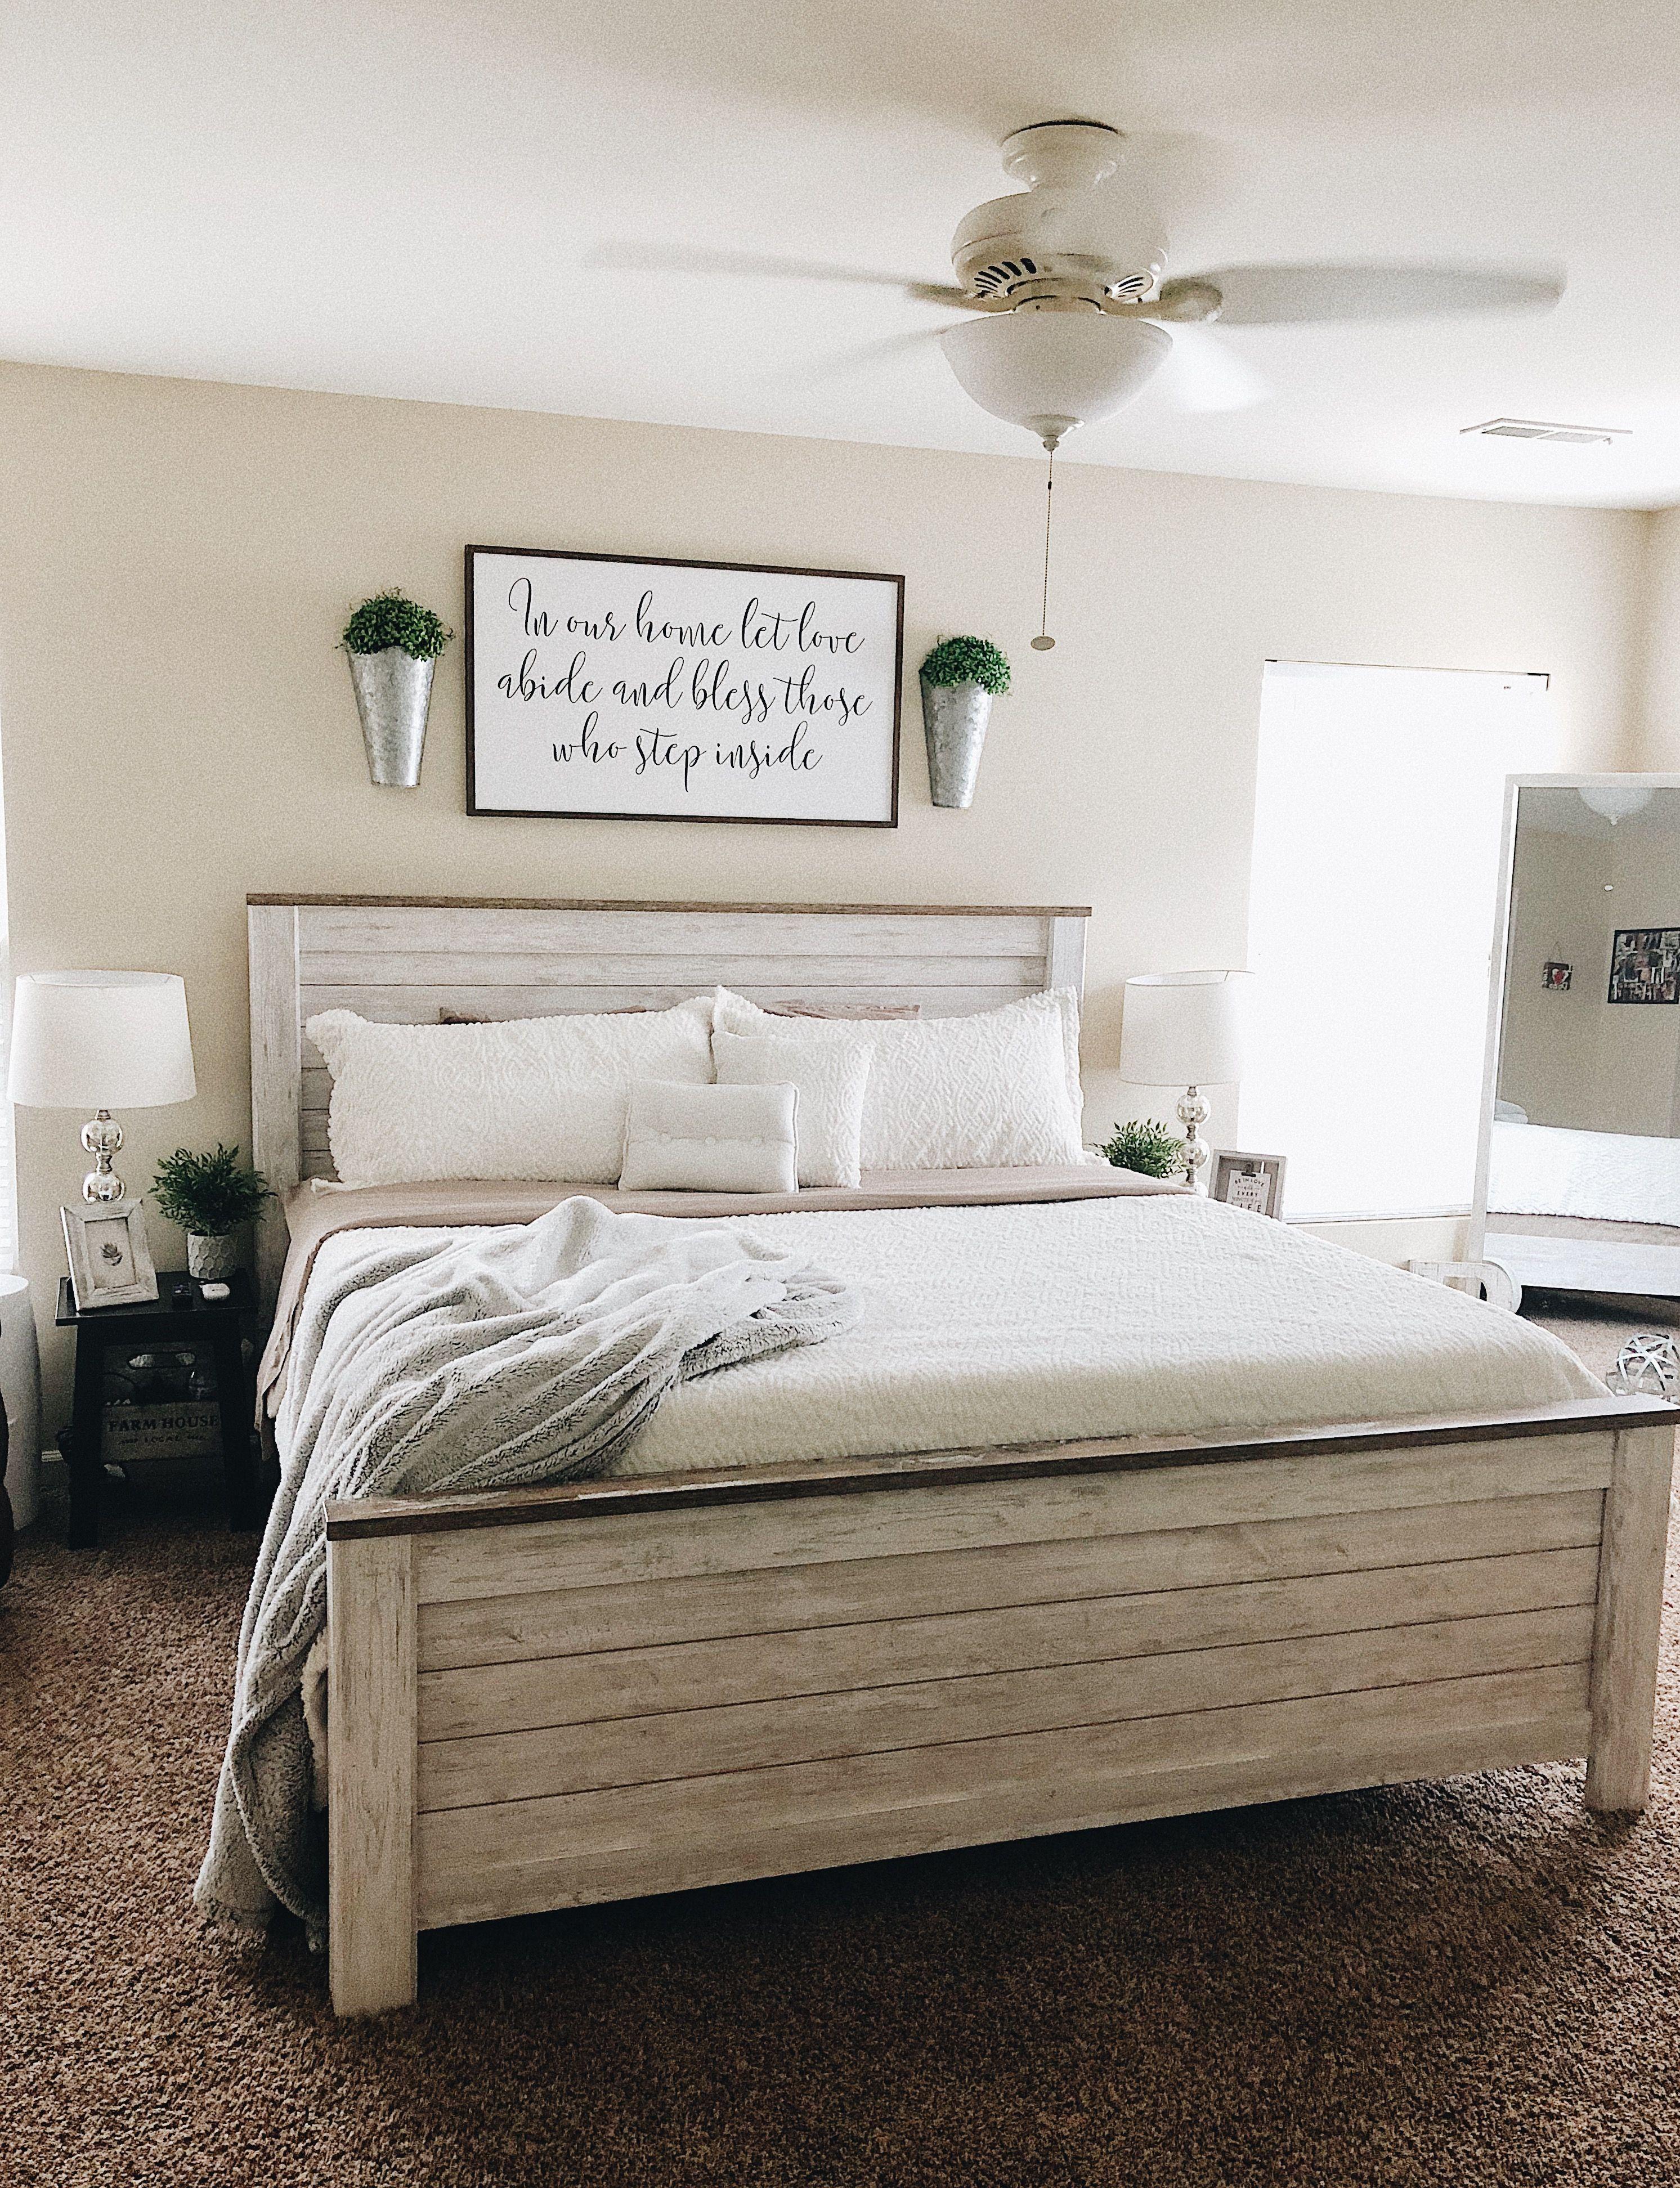 Modern Farmhouse bedroom makeover.🌿 farmhouse